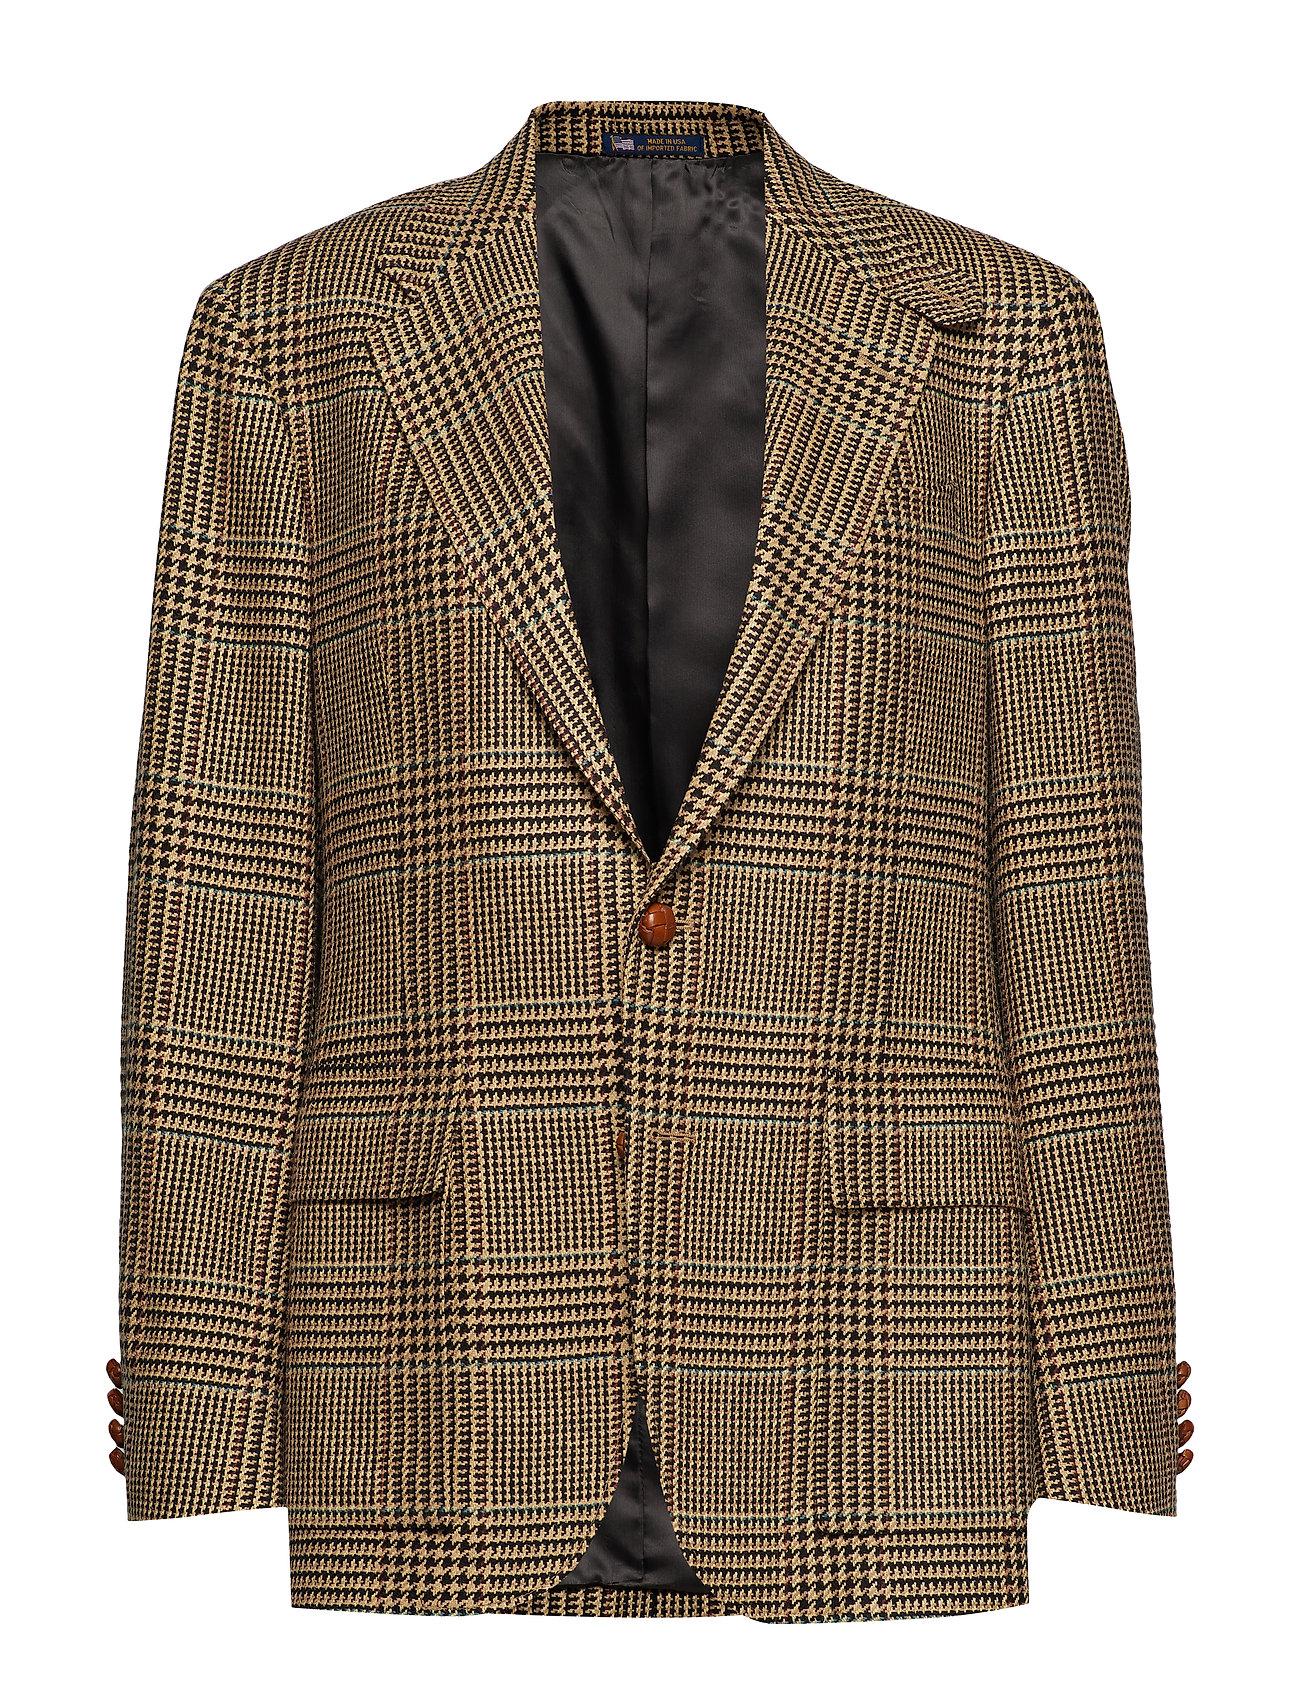 Polo Ralph Lauren The RL67 Glen Plaid Jacket - BLACK AND CREAM W